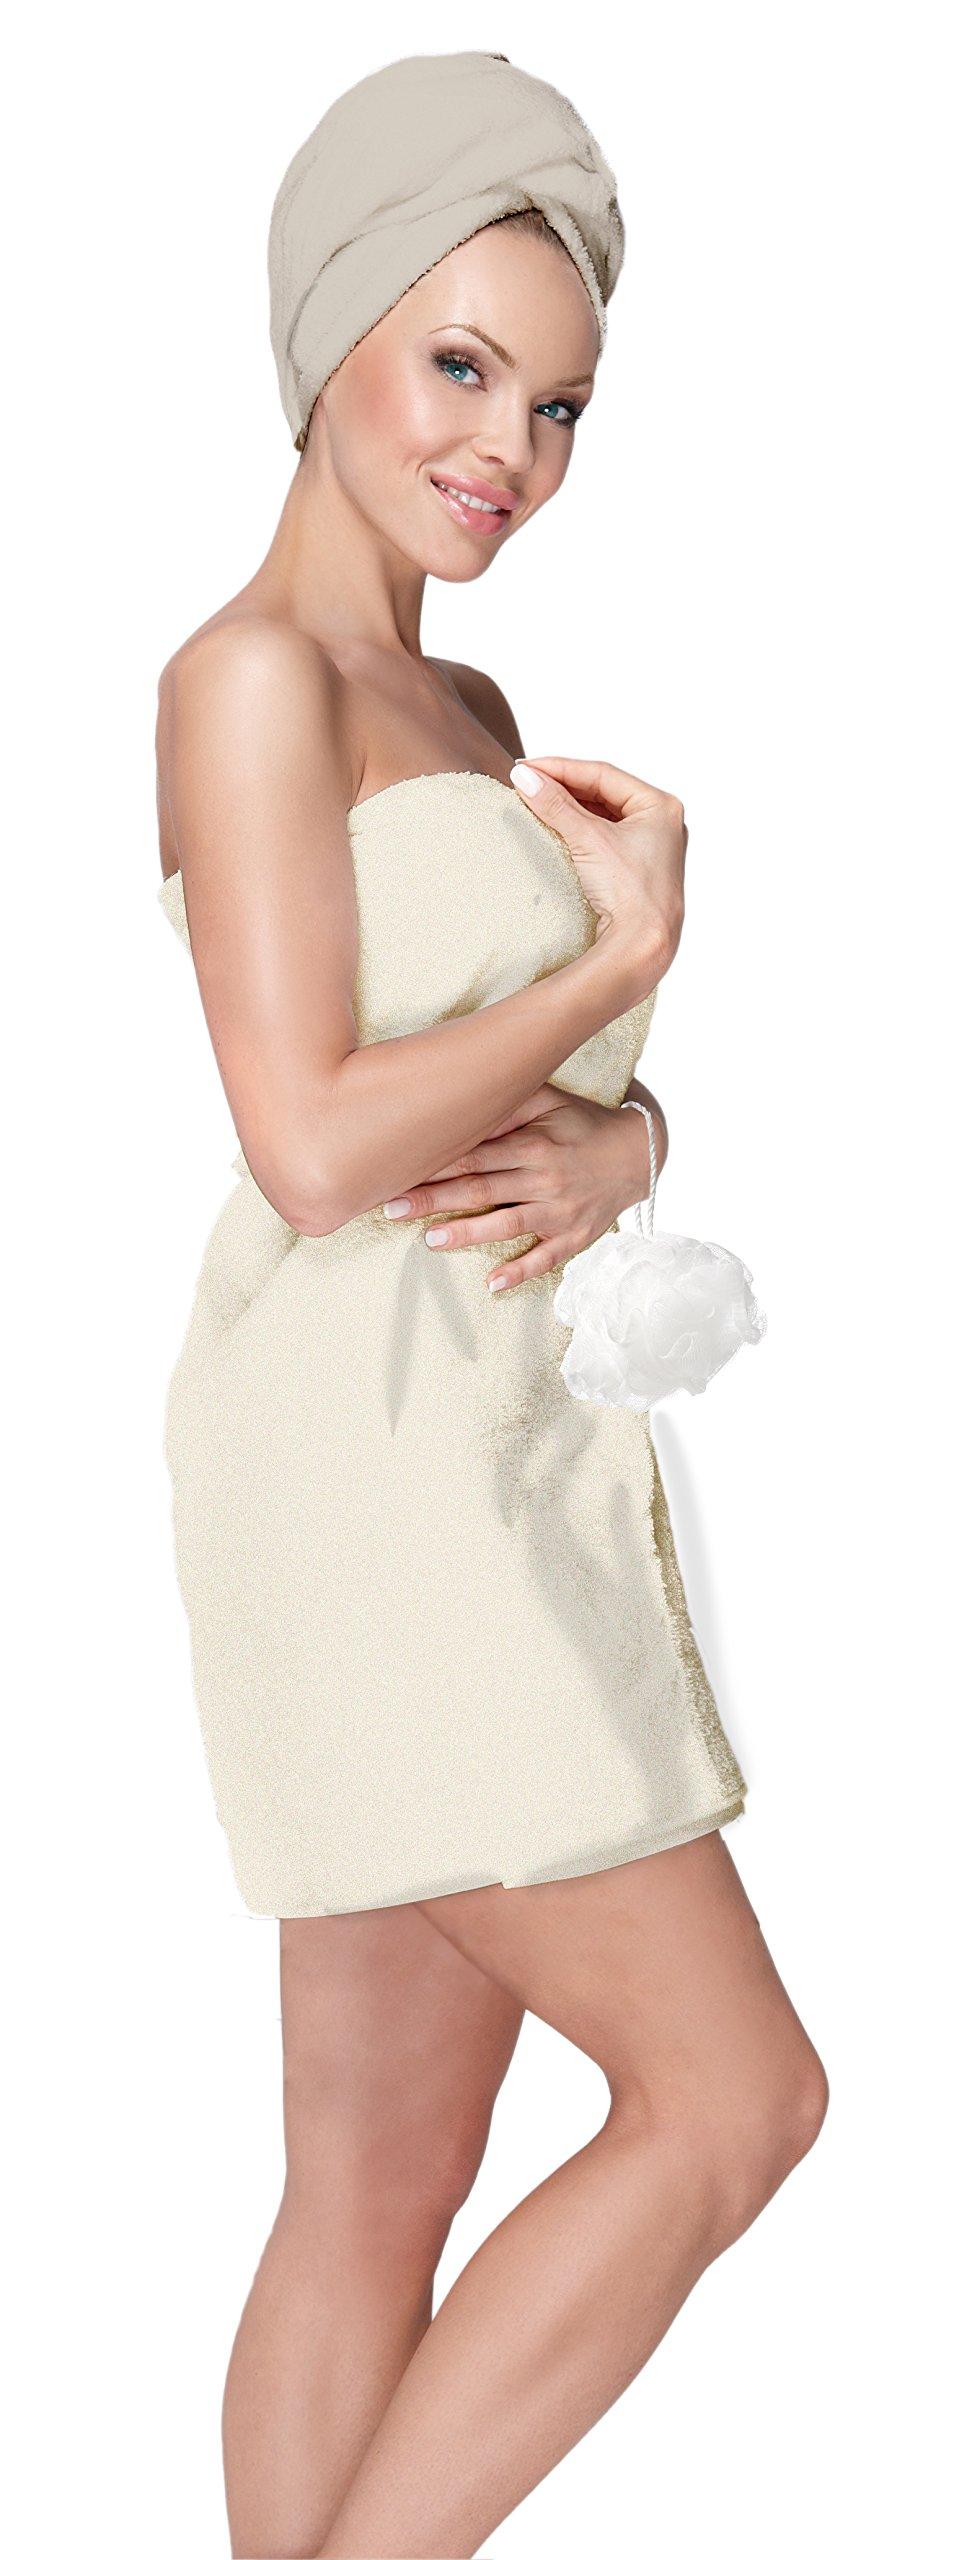 Adrienne Vittadini Women's 3 Piece Bath Body Plush Shower Towel Wrap Spa Set | Bath Body Towel Wrap with Adjustable Fastener, Hair Towel Twist, Loofah/Bath Body Sponge